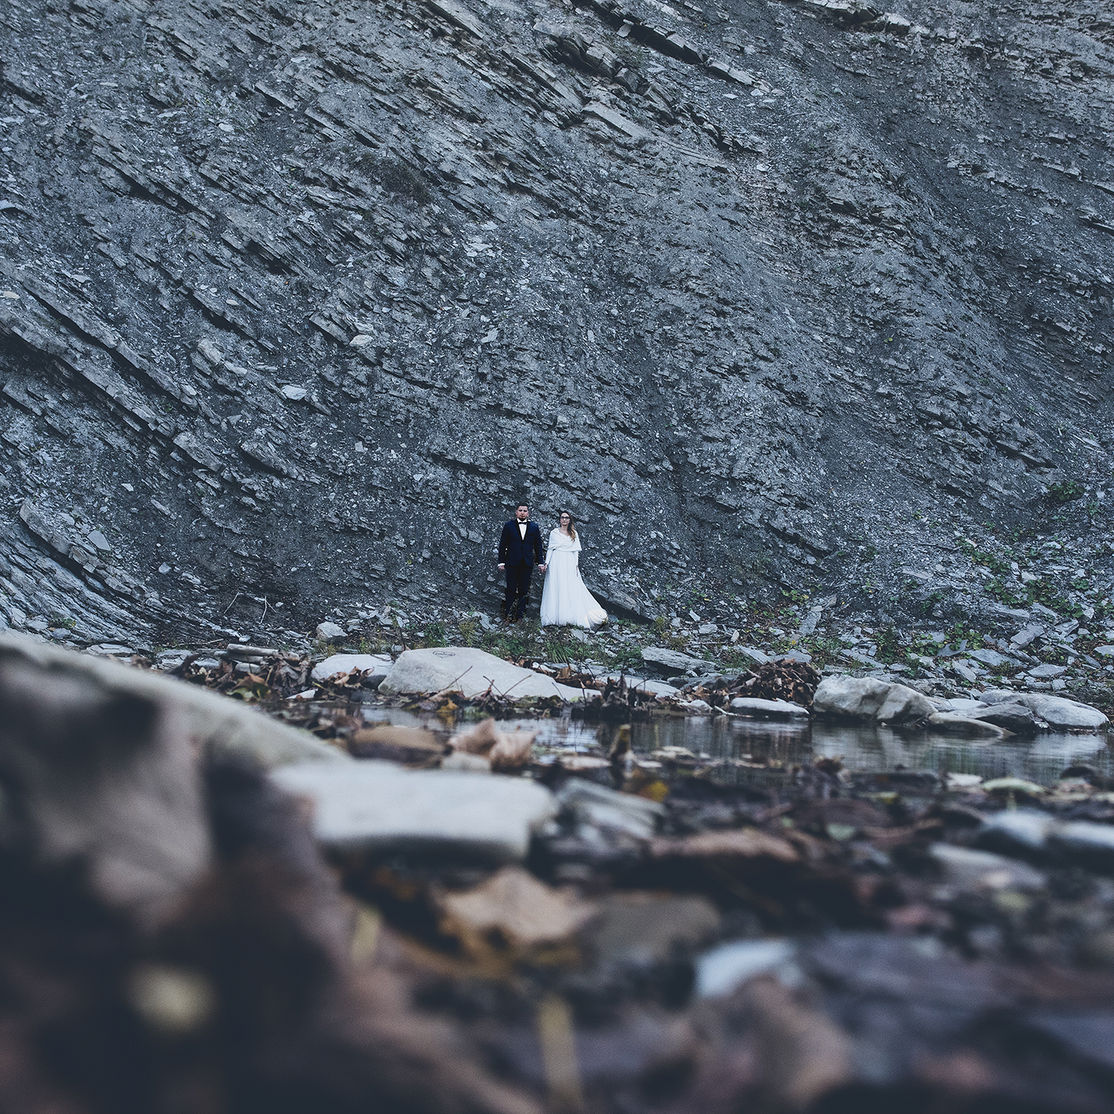 fotograf tarnobrzeg.jpg